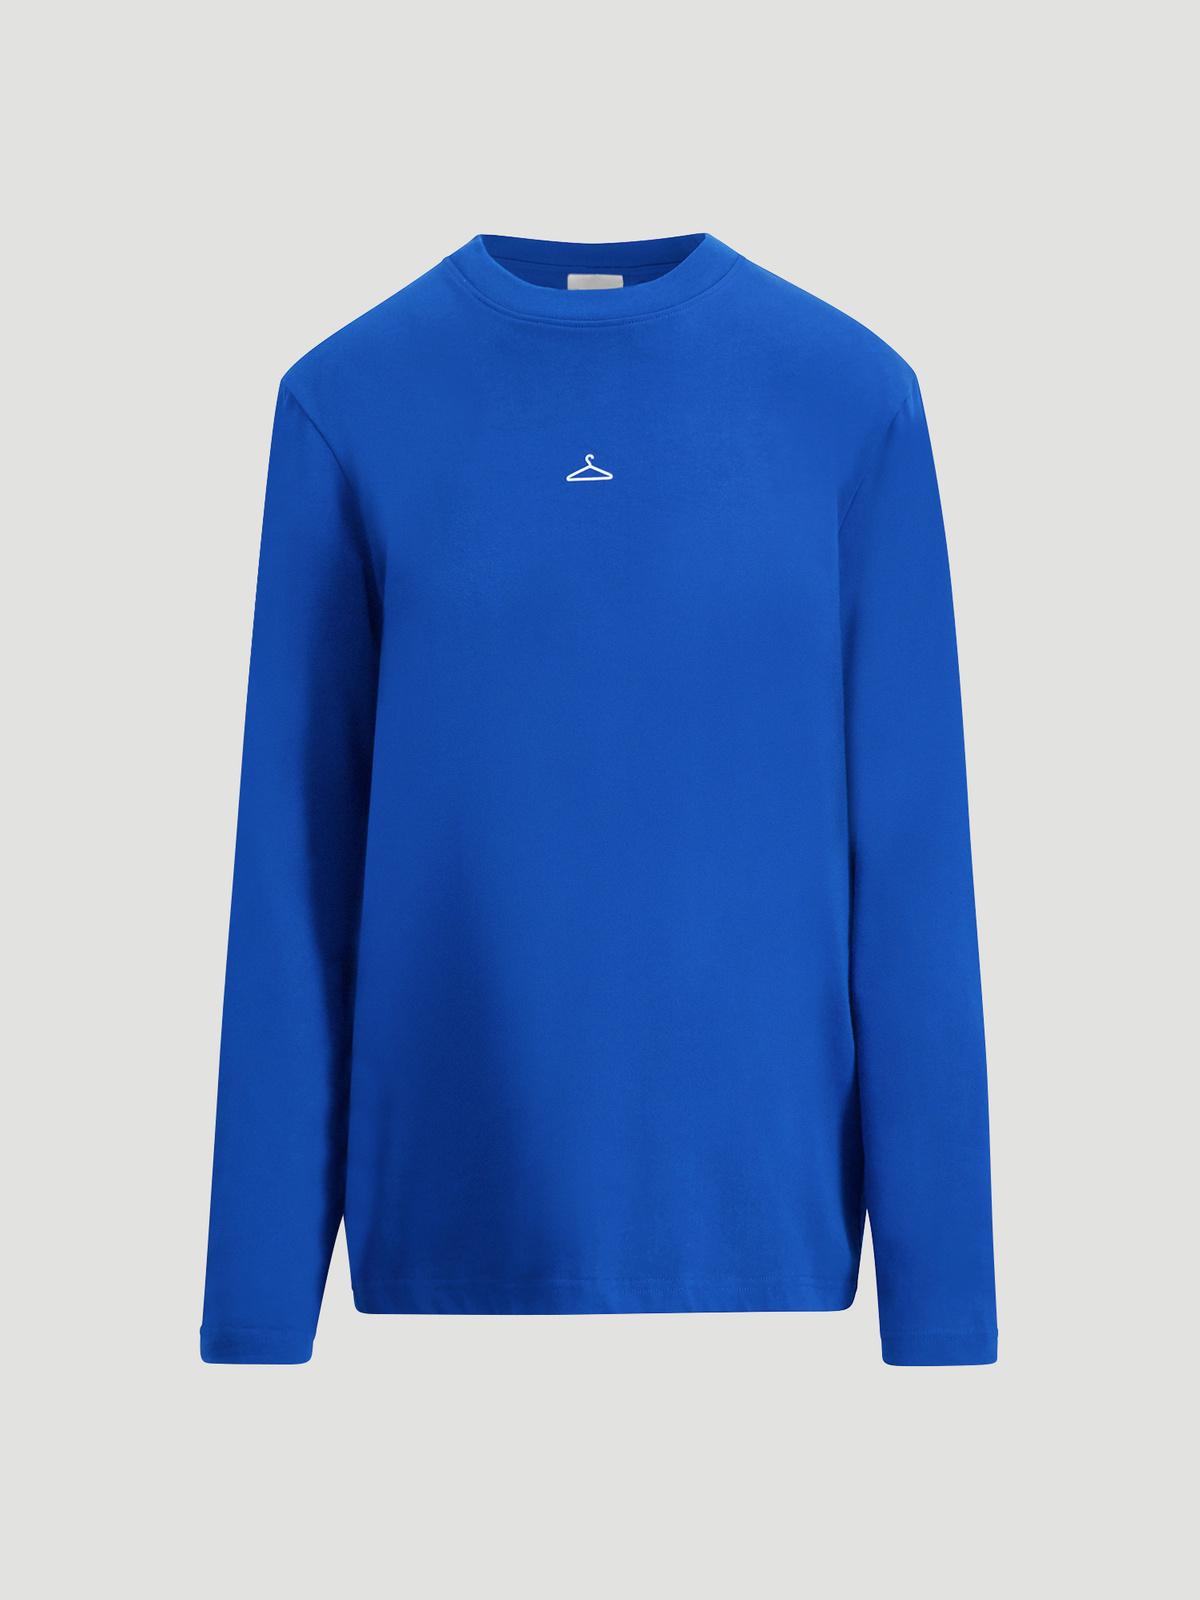 Hanger Longsleeve Blue 0